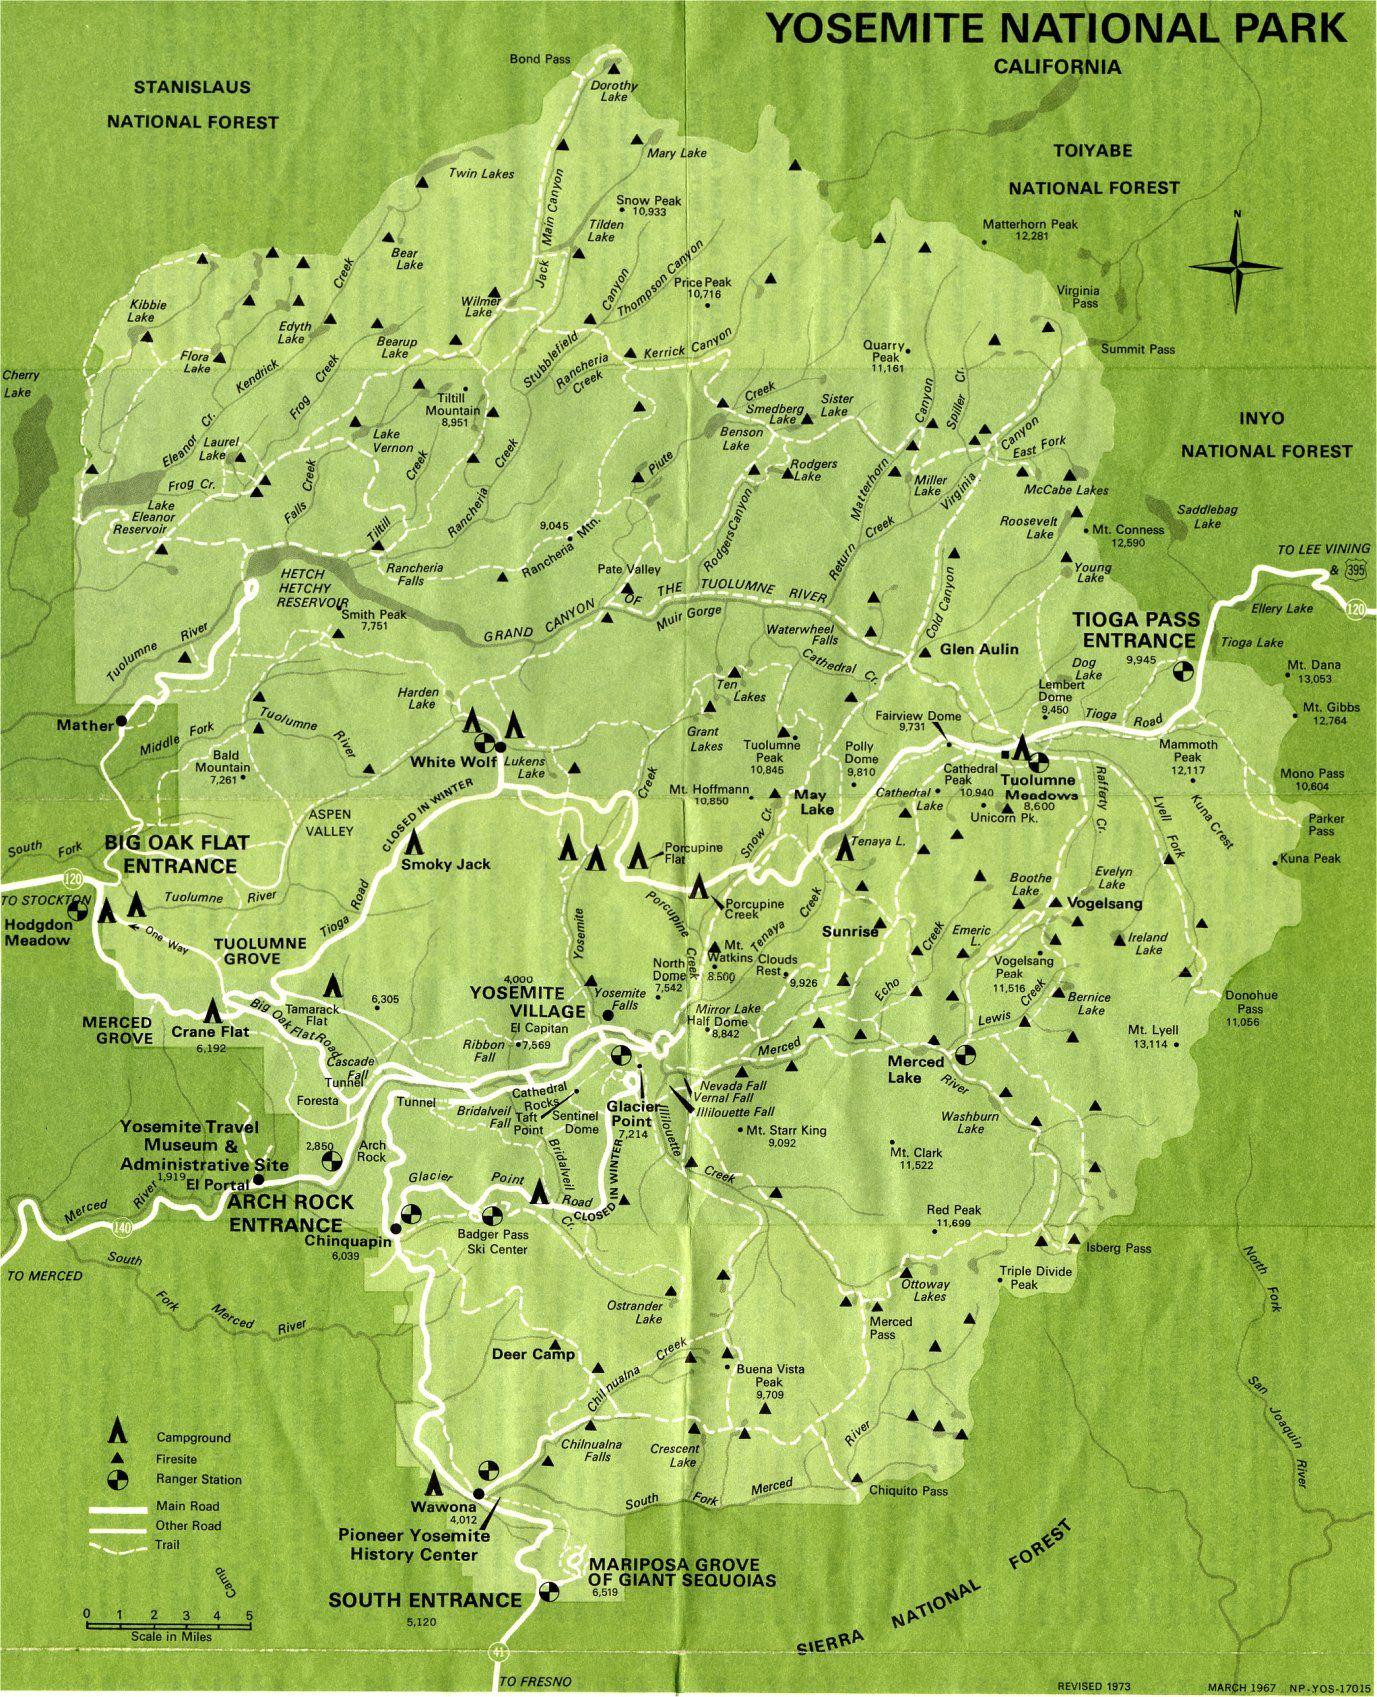 Yosemite National Park Map | Yosemite Valley Yosemite National Park - Yosemite California Map